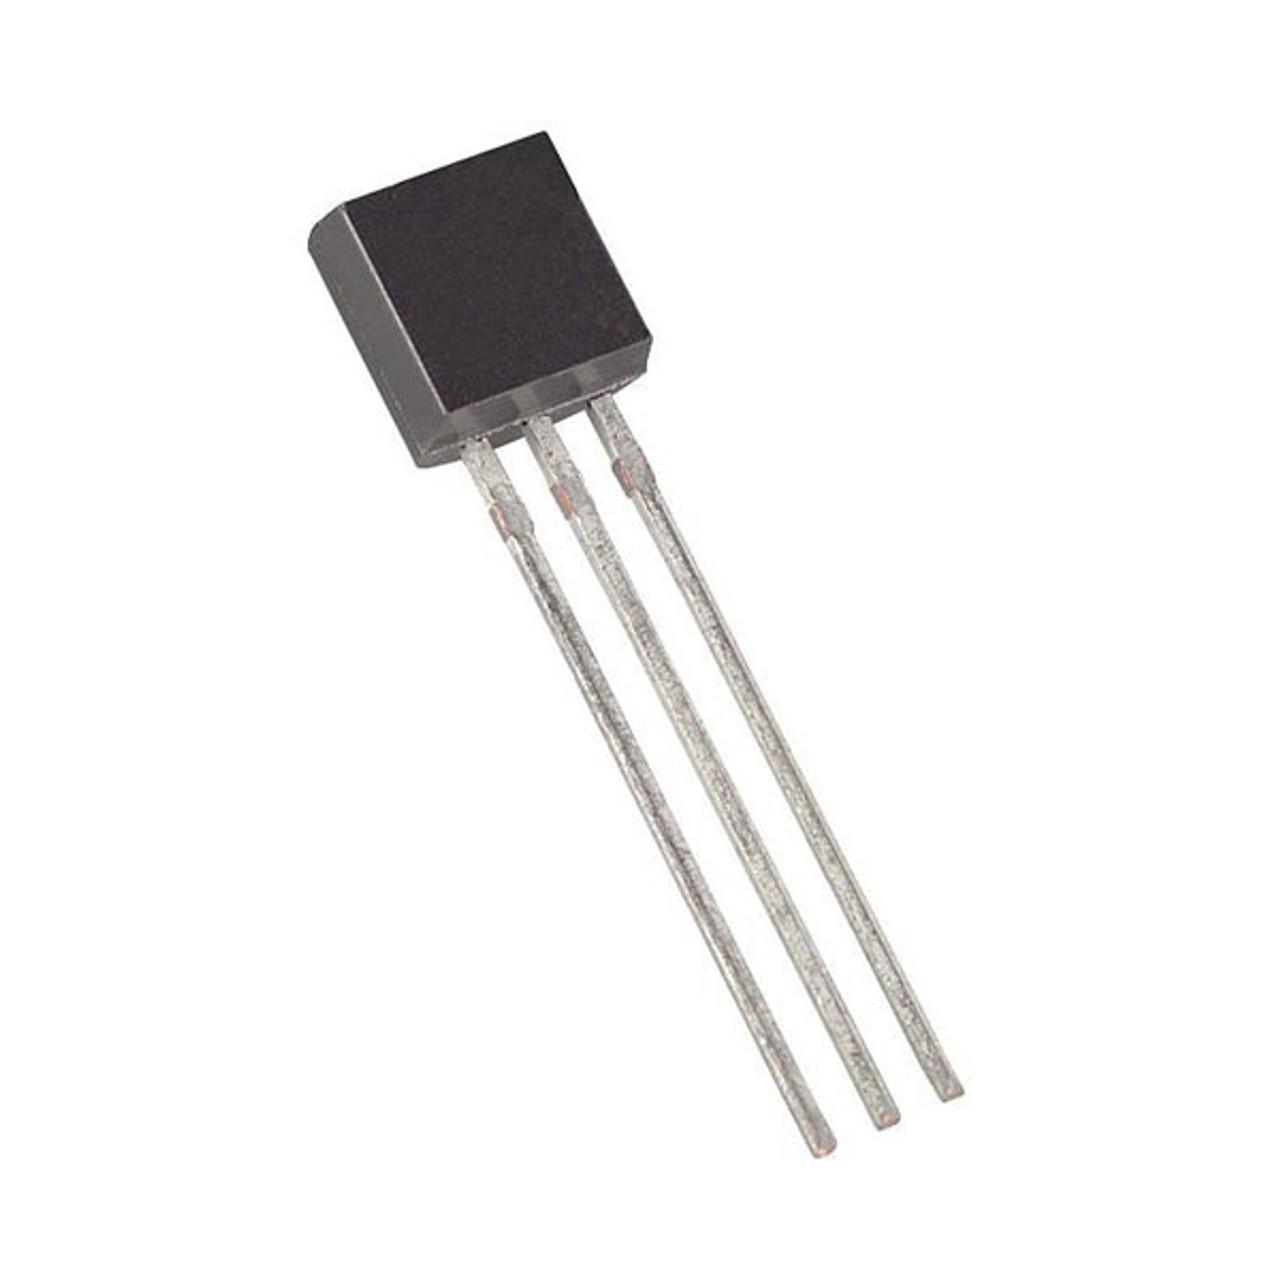 DS18B20 Digital Temperature Sensor for Arduino - Pack of 5